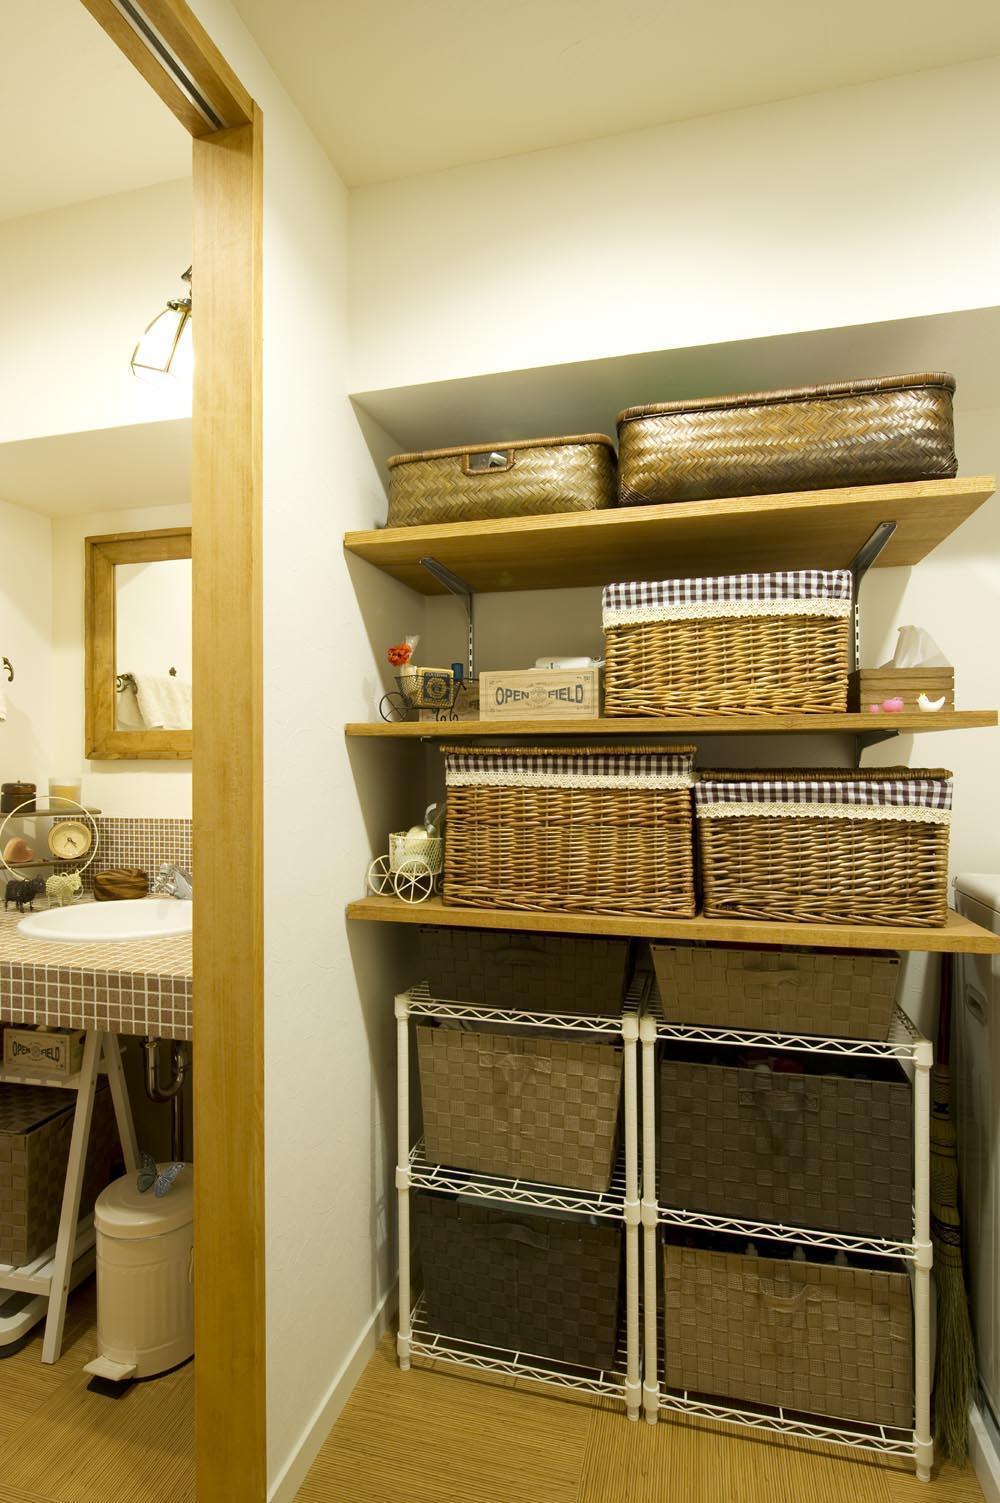 I邸・斜めに配置したキッチンで、動きと変化をの部屋 洗面所横の収納スペース